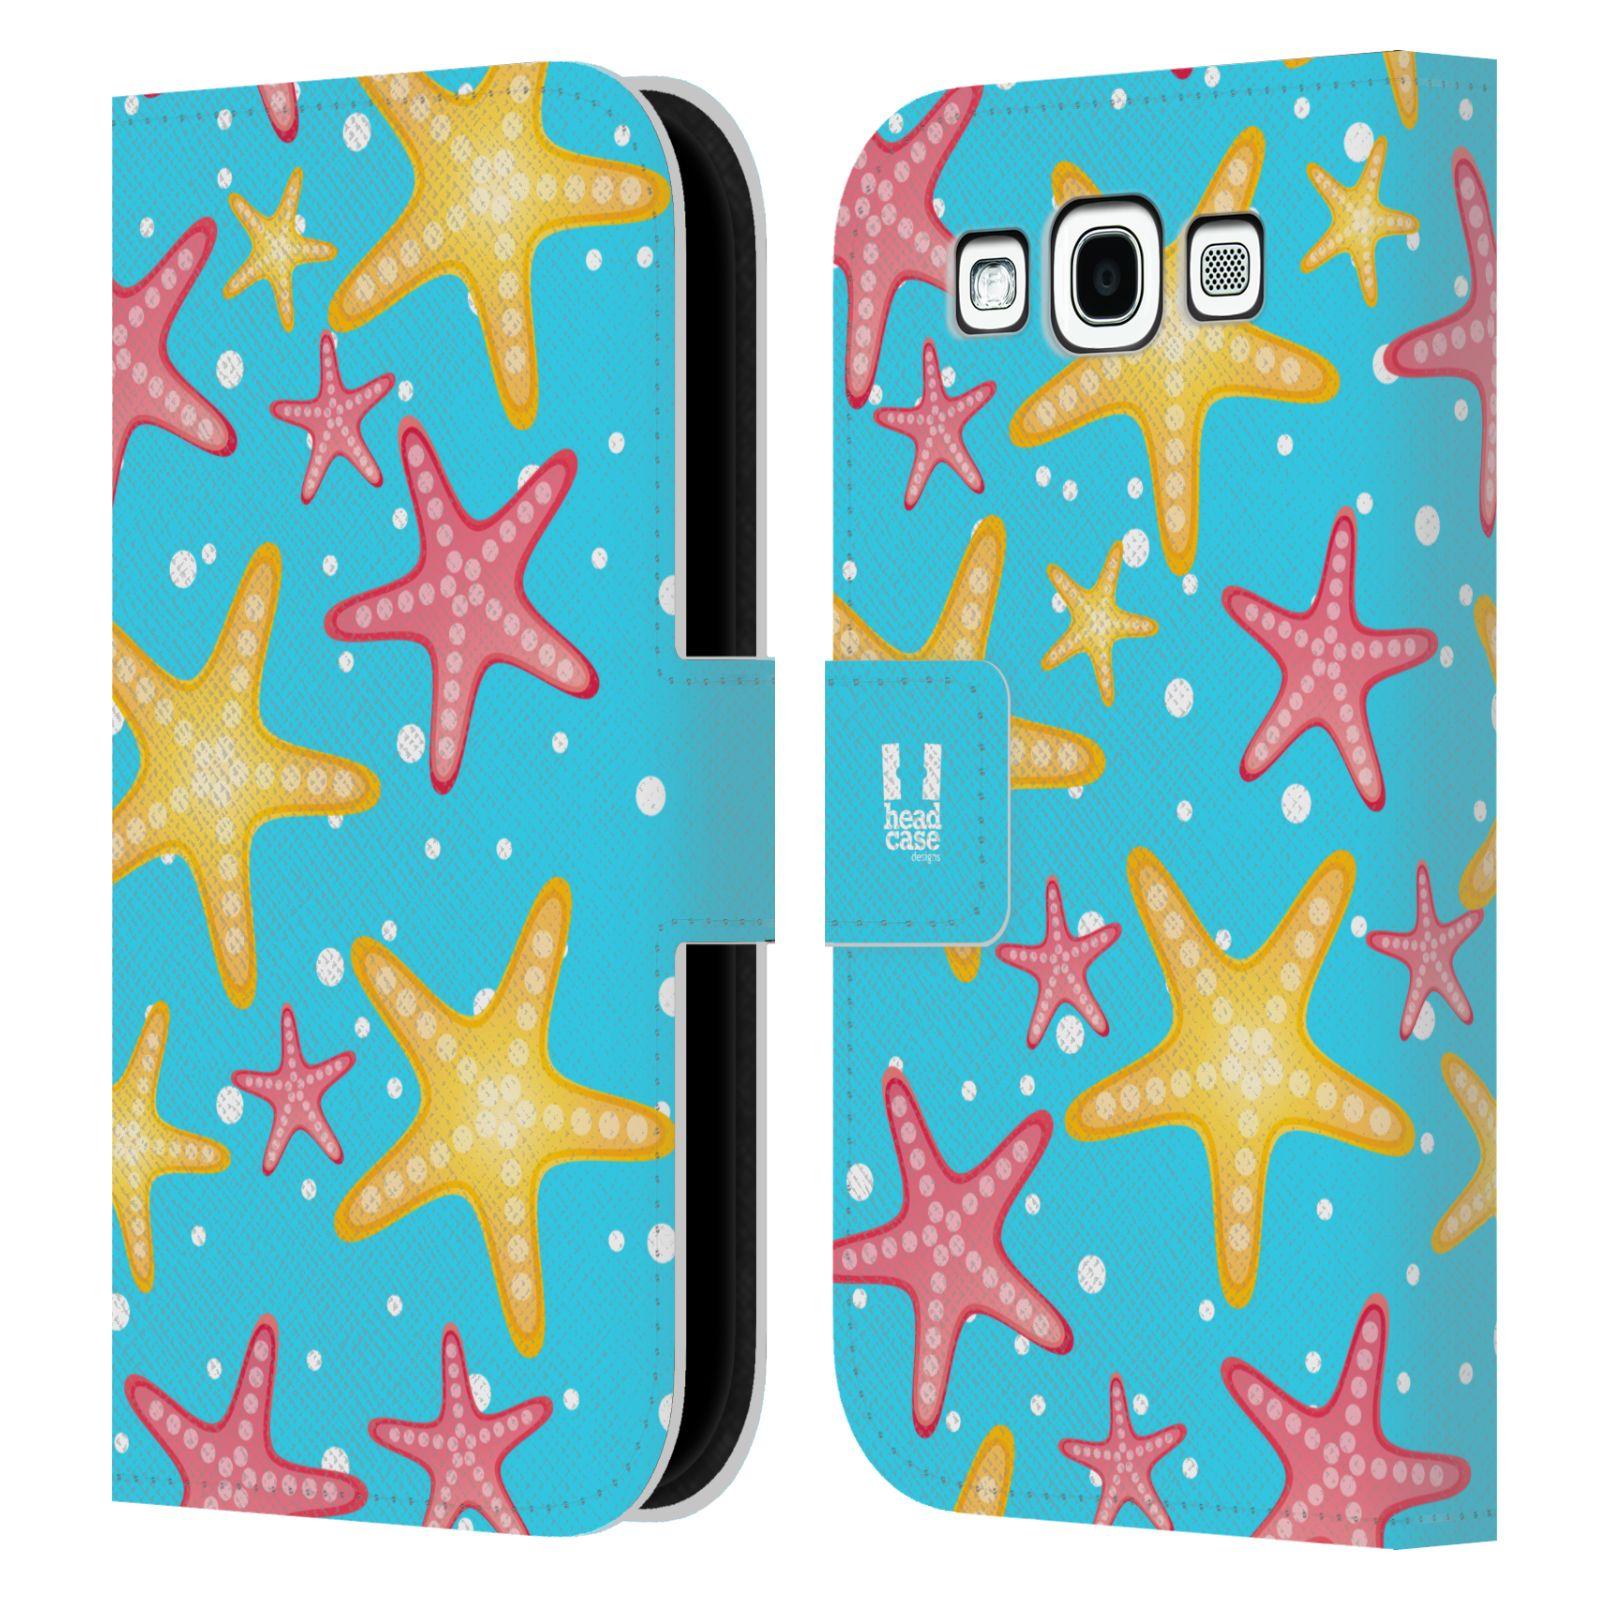 HEAD CASE Flipové pouzdro pro mobil Samsung Galaxy S3 Mořský živočich hvězdice modrá barva pozadí